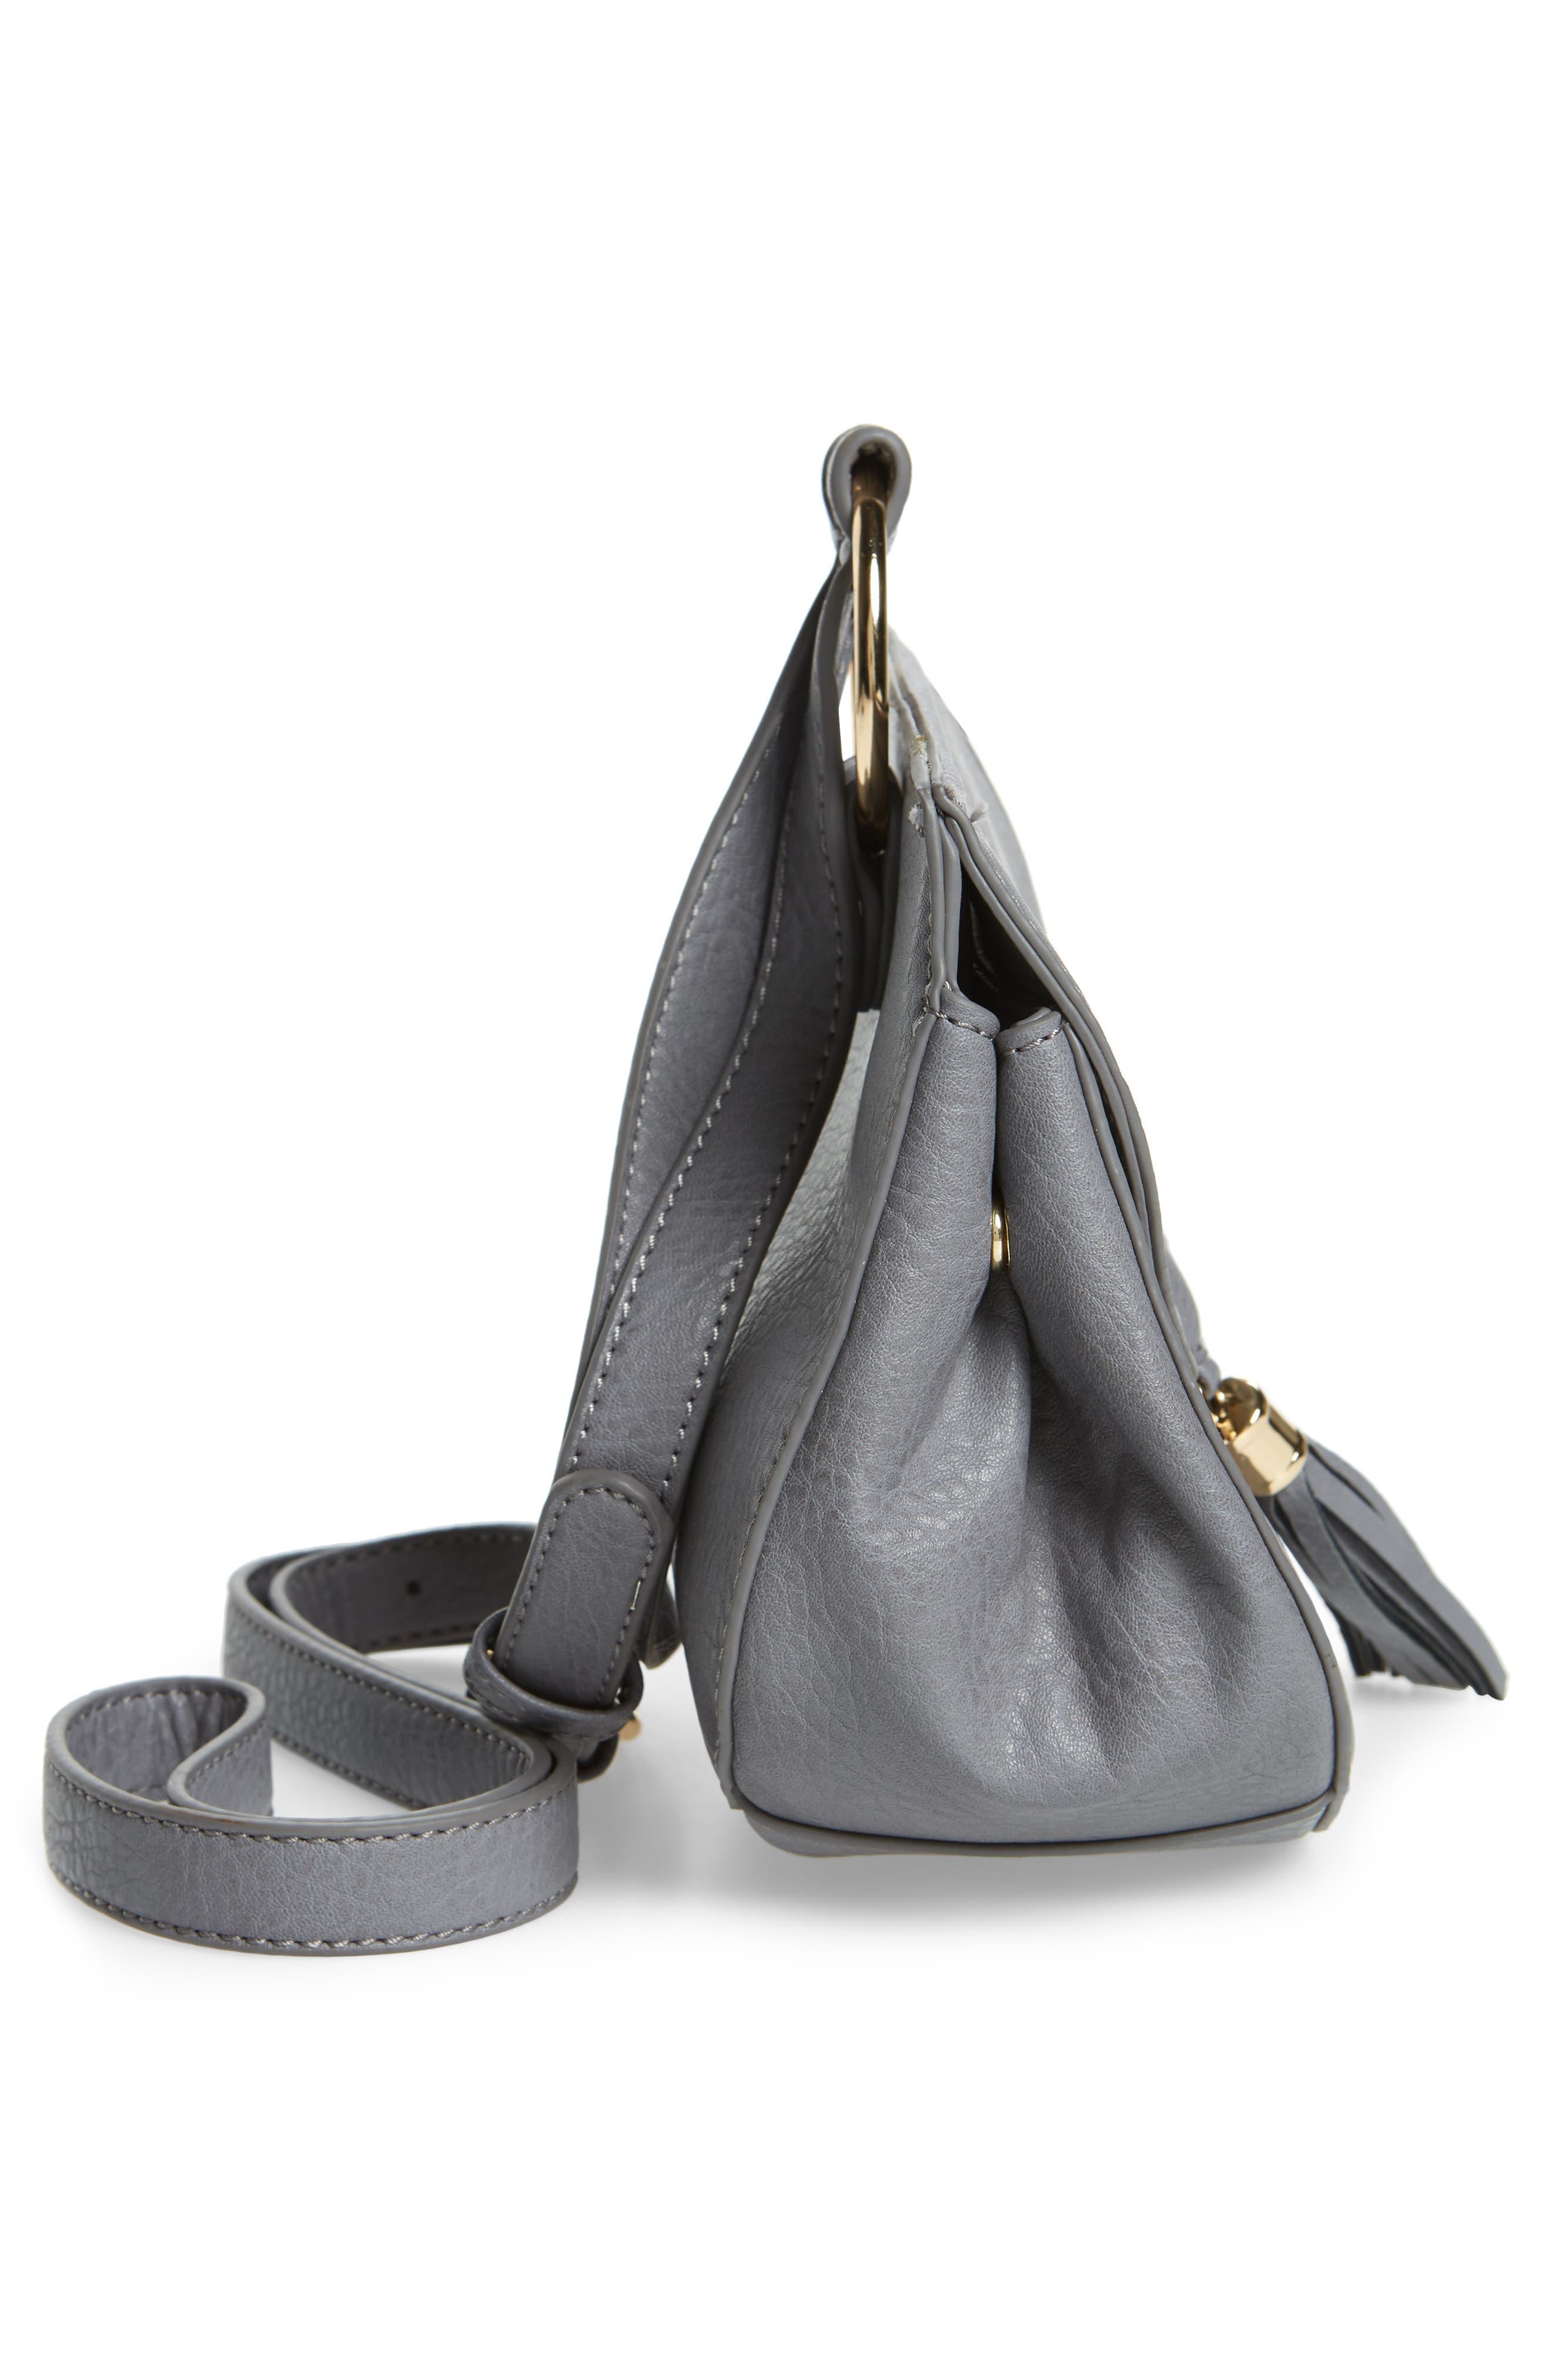 Tassel Faux Leather Crossbody Saddle Bag,                             Alternate thumbnail 5, color,                             Grey